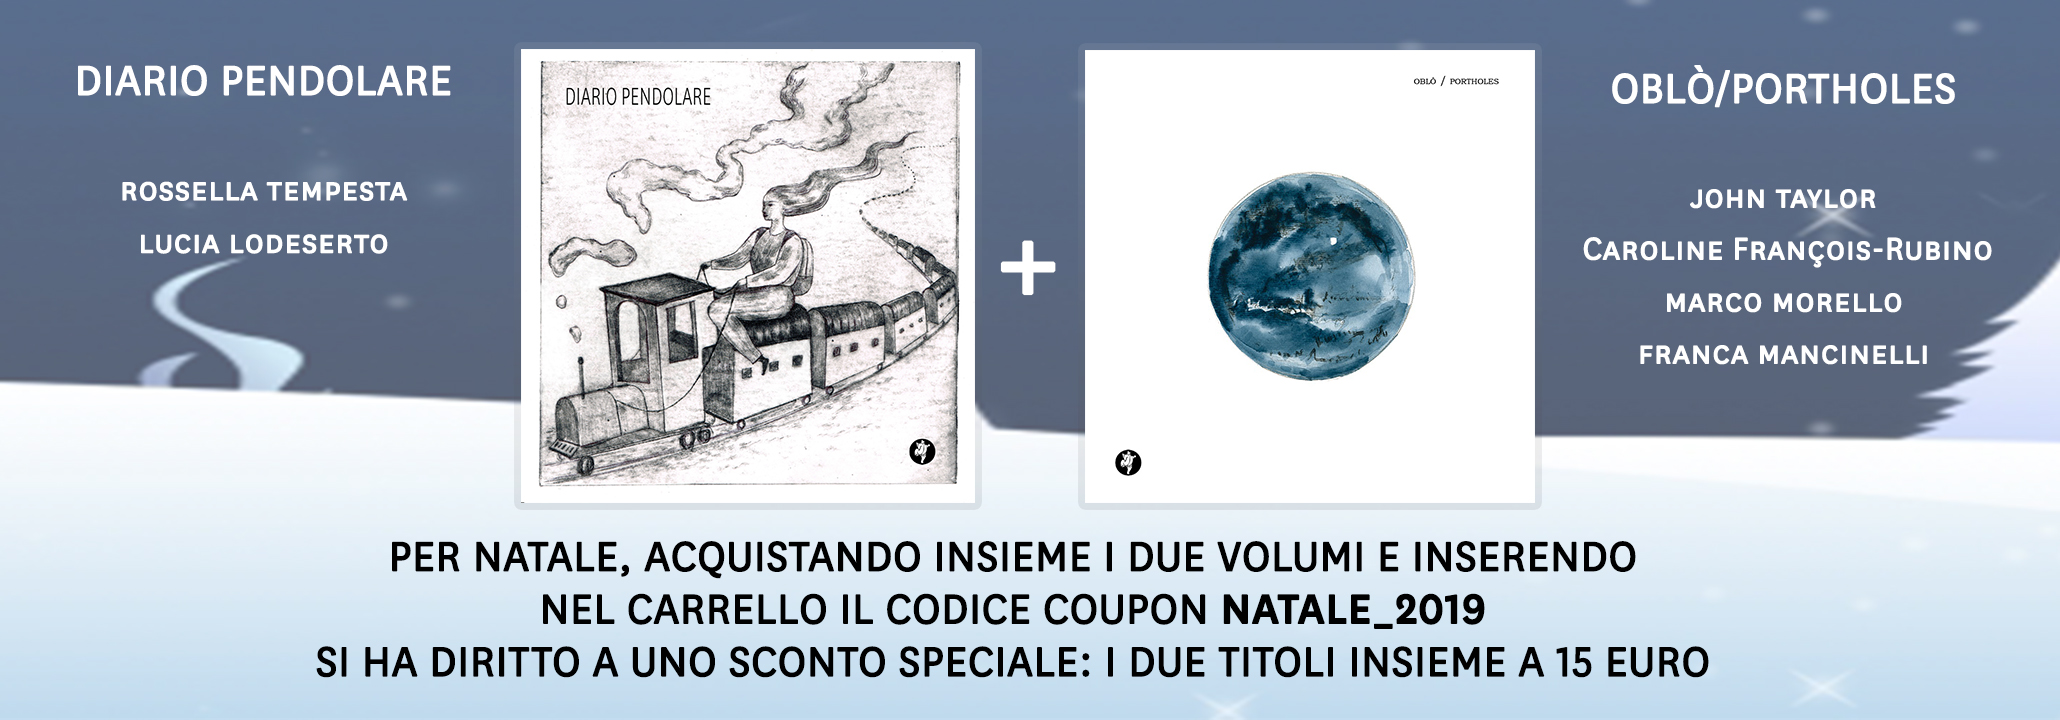 offerta-natale-2019